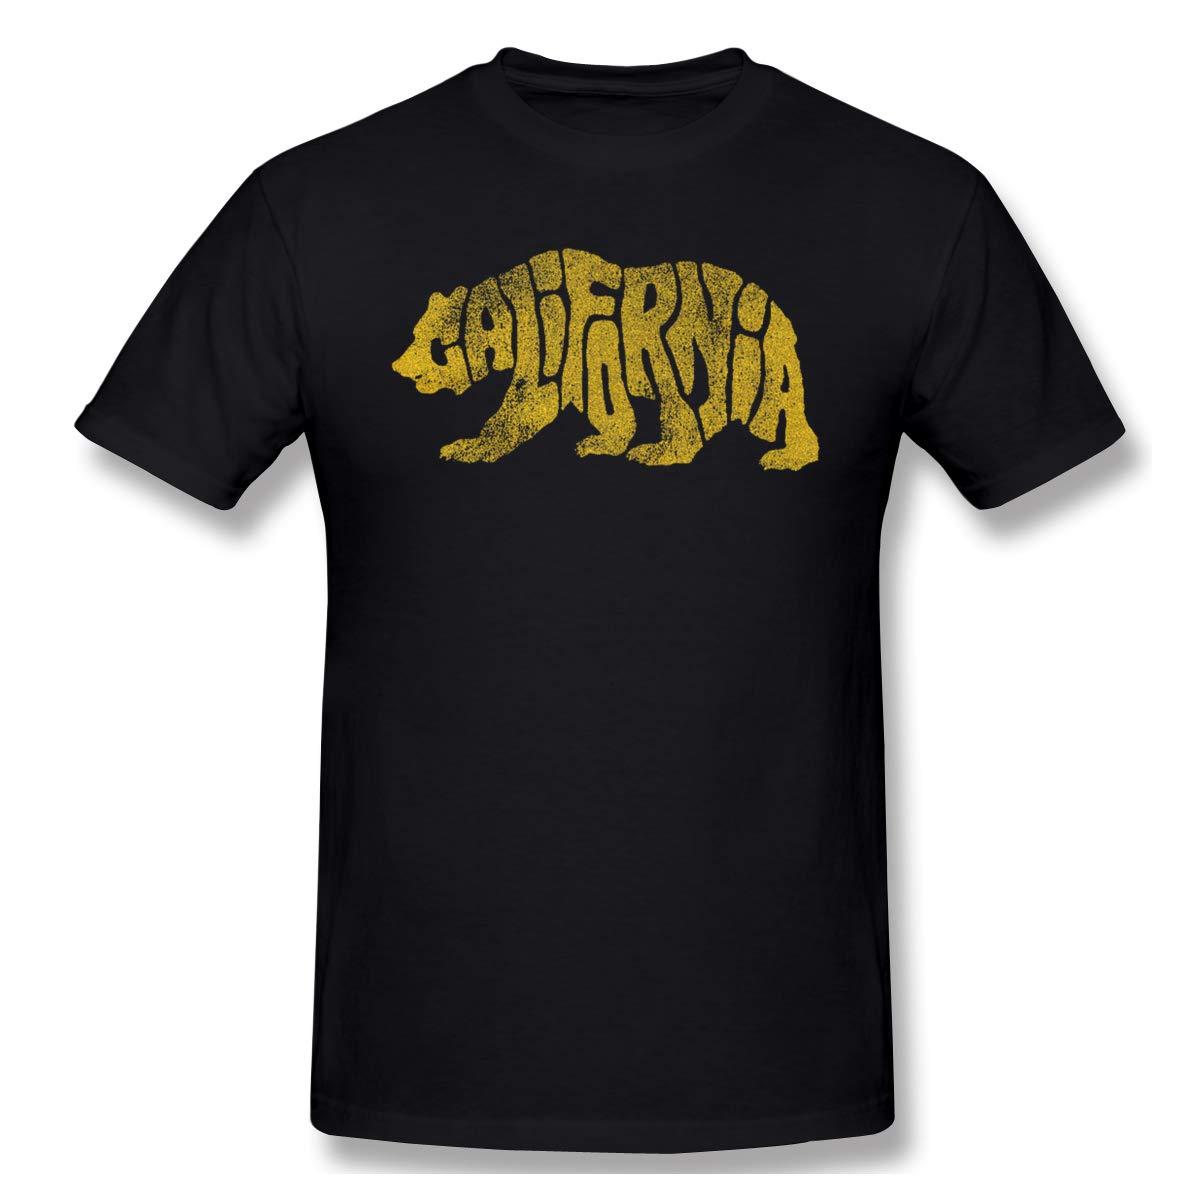 S California Comfortable Black Tees Shirts